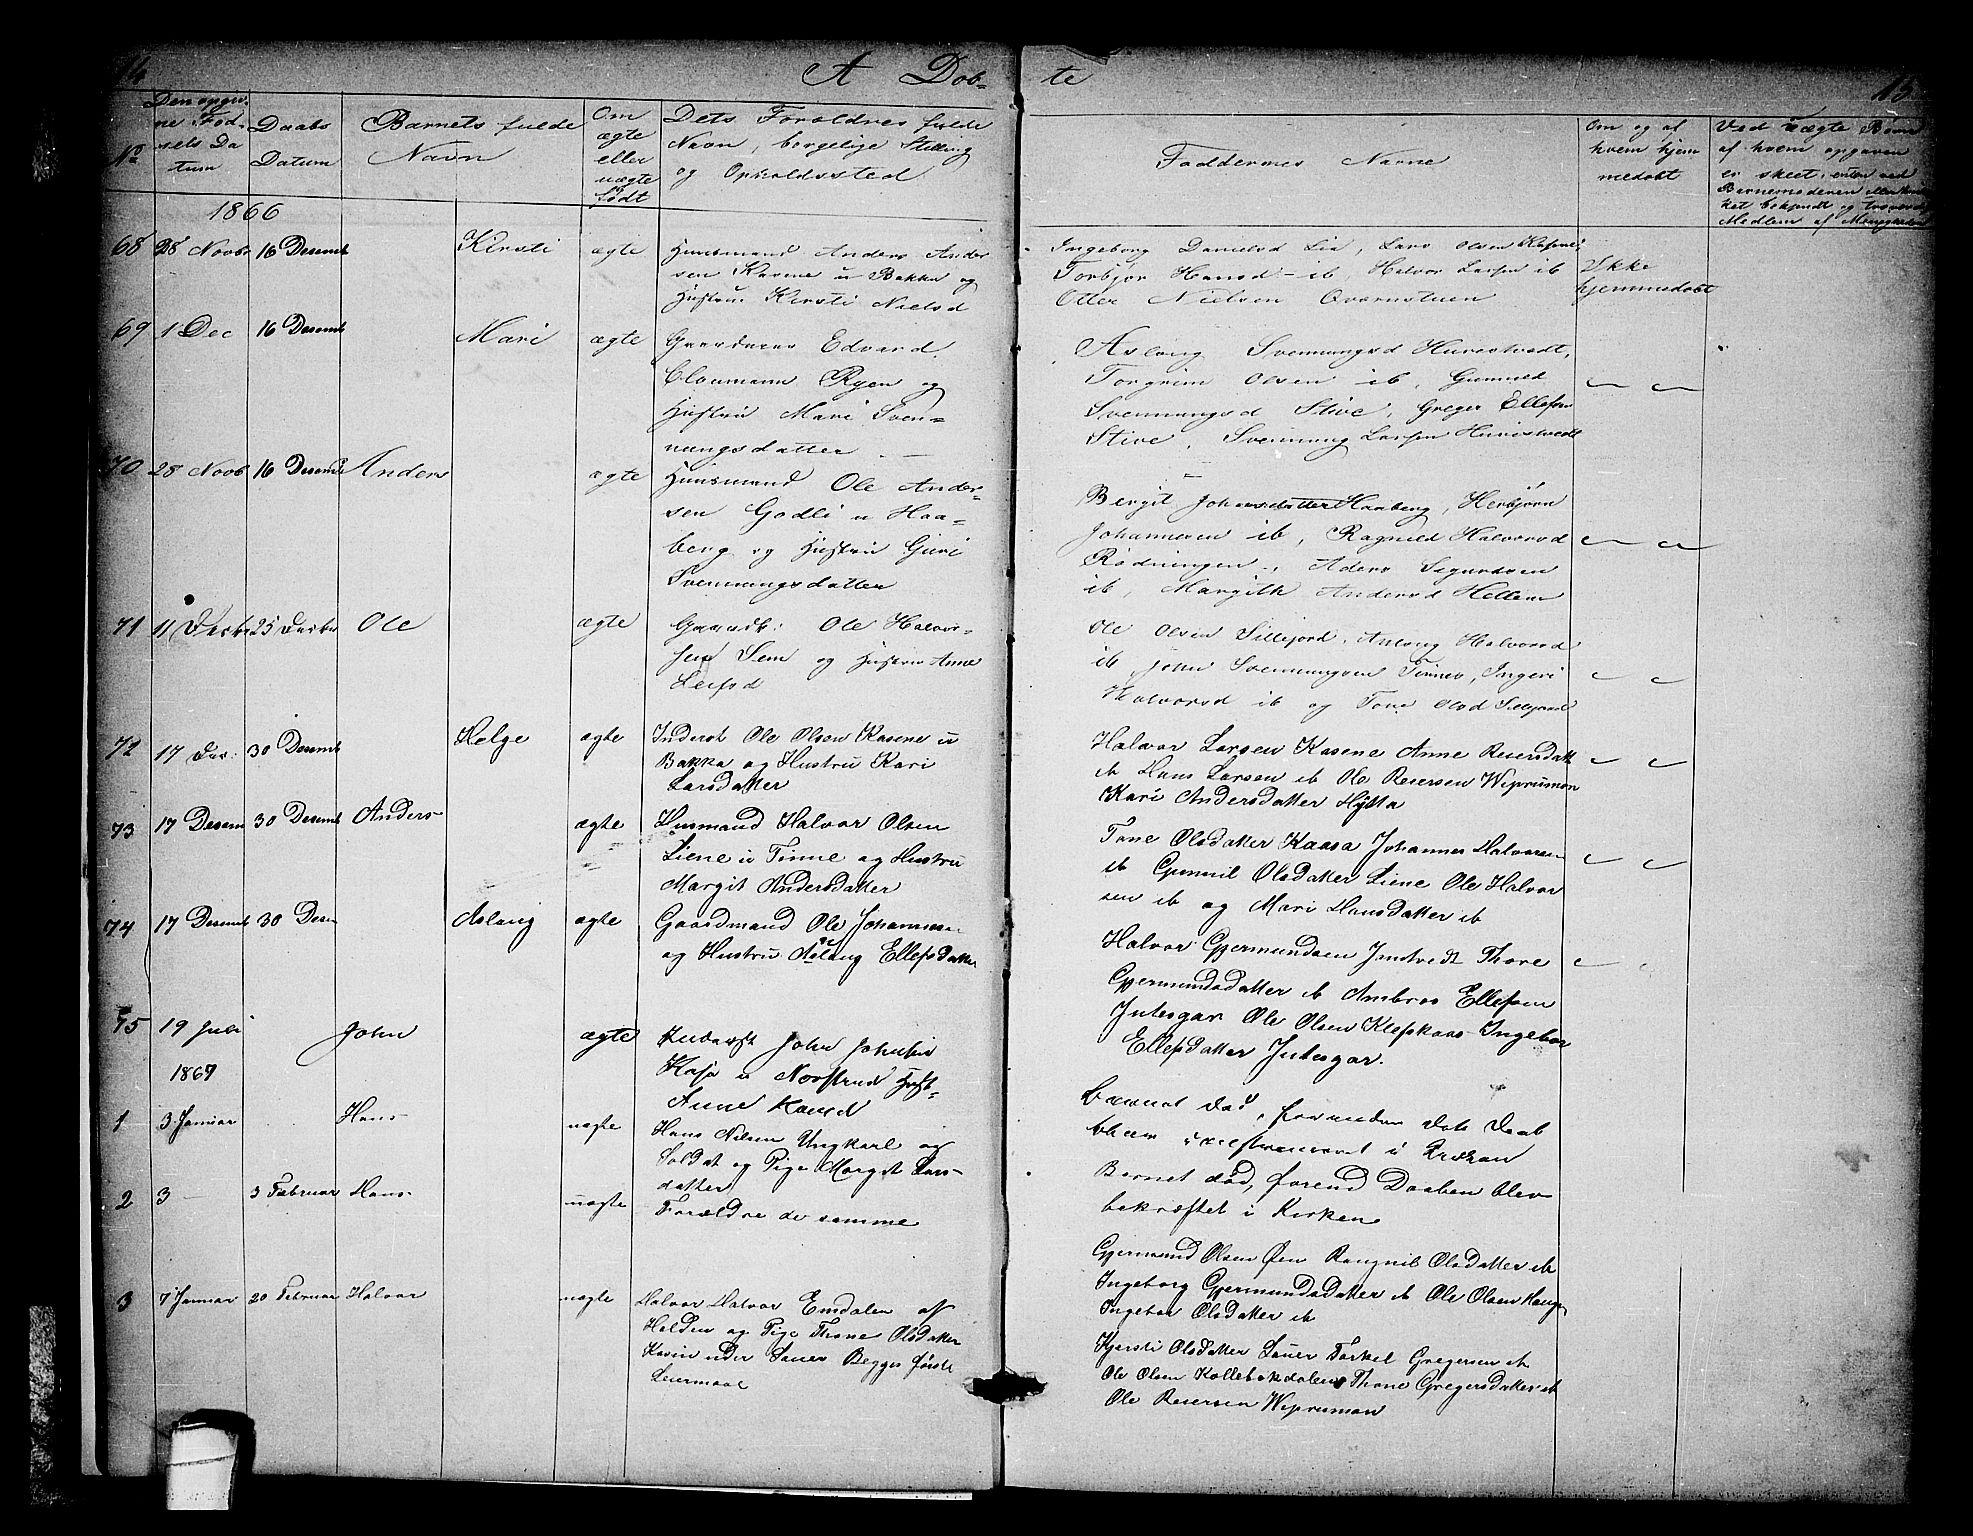 SAKO, Heddal kirkebøker, G/Ga/L0001: Klokkerbok nr. I 1, 1866-1878, s. 14-15